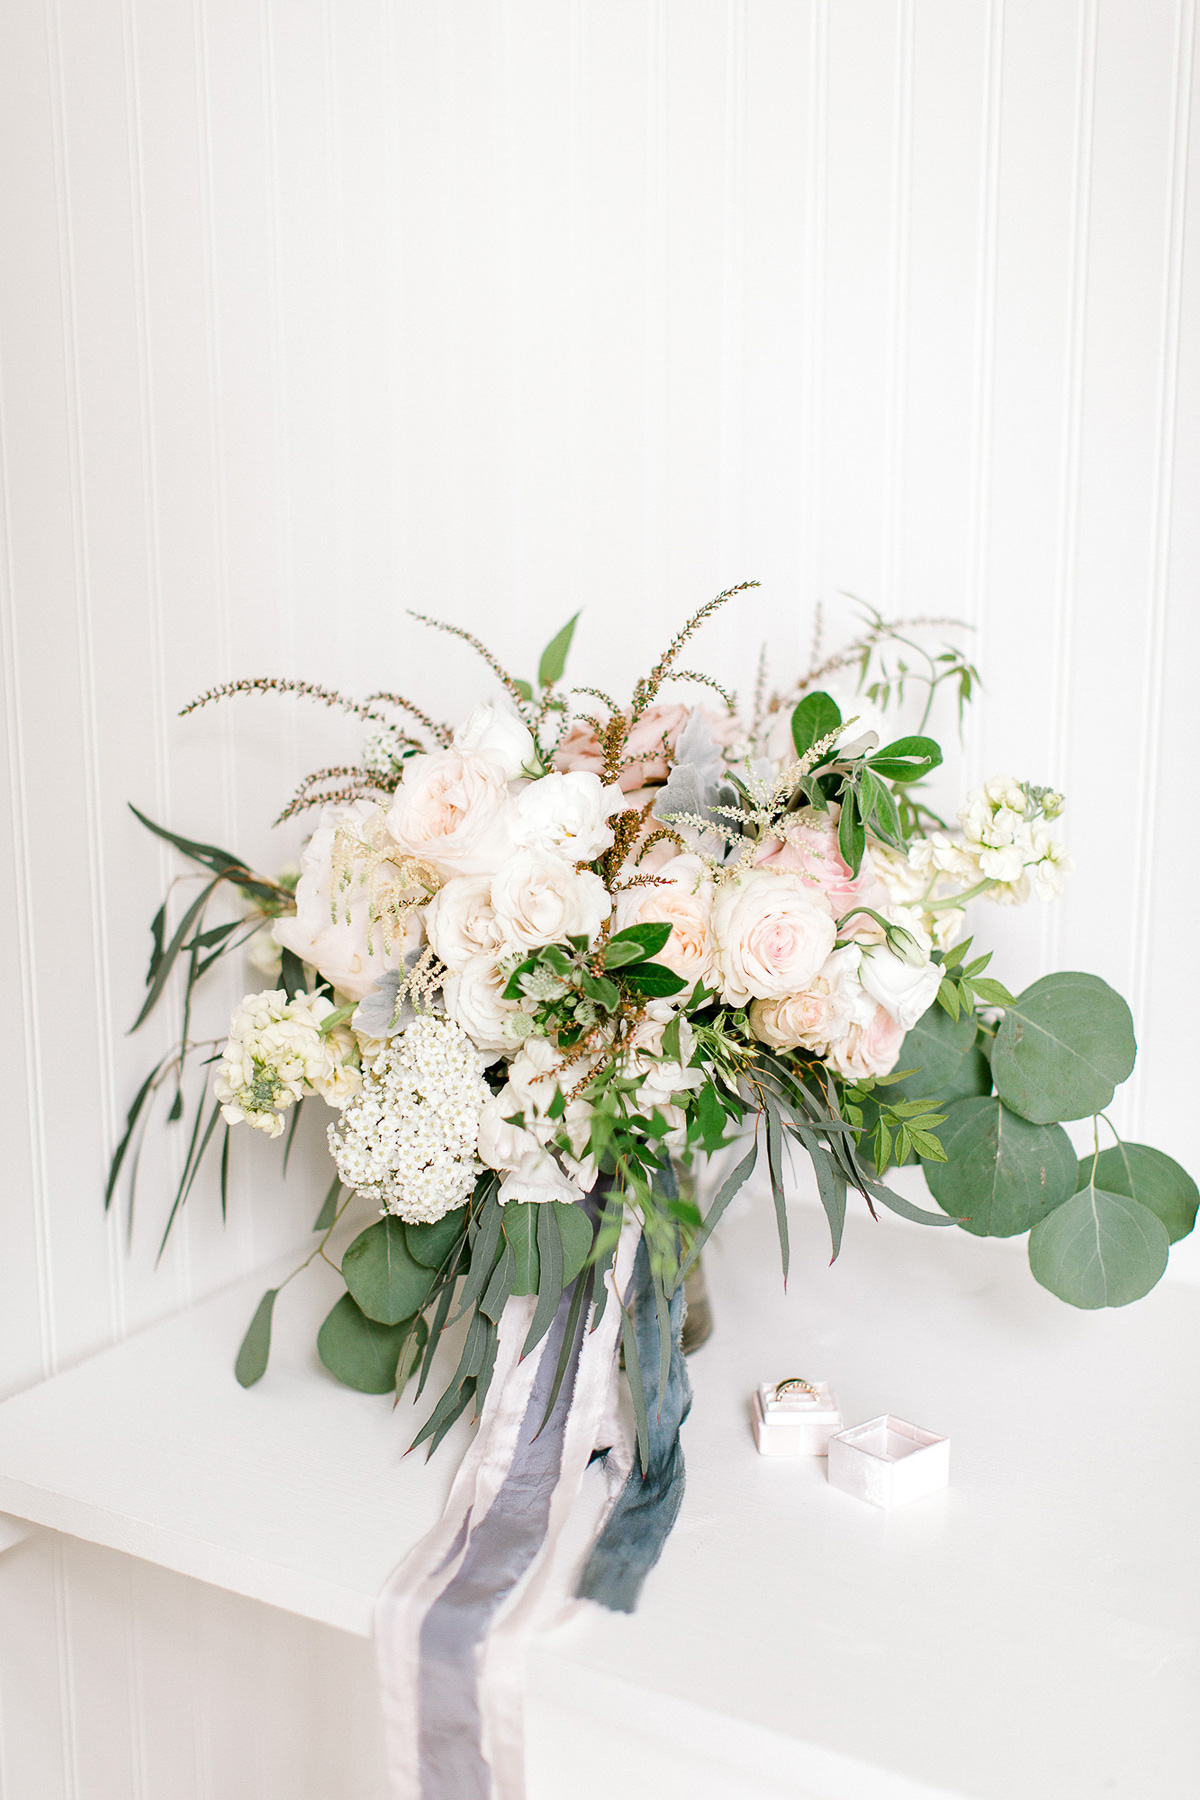 beatrice-elford-photography-vineyard-bride-swish-list-balls-falls-vineland-wedding-6.jpg